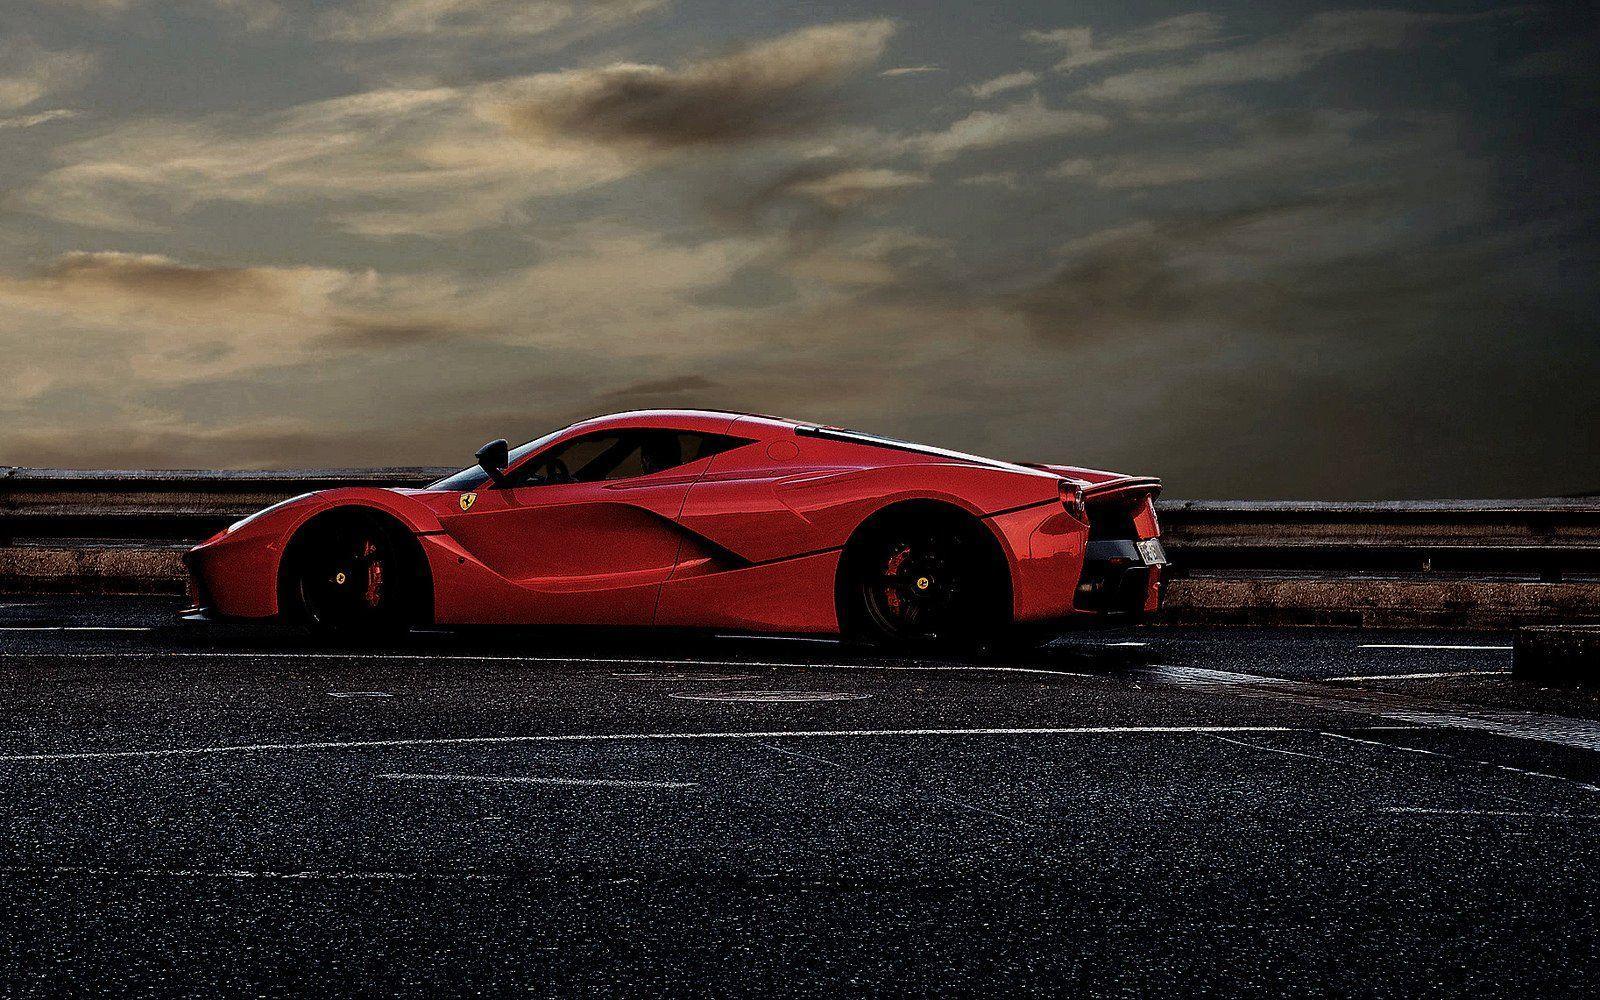 46+ Ferrari 208 Wallpaper Hd For Desktop  Background